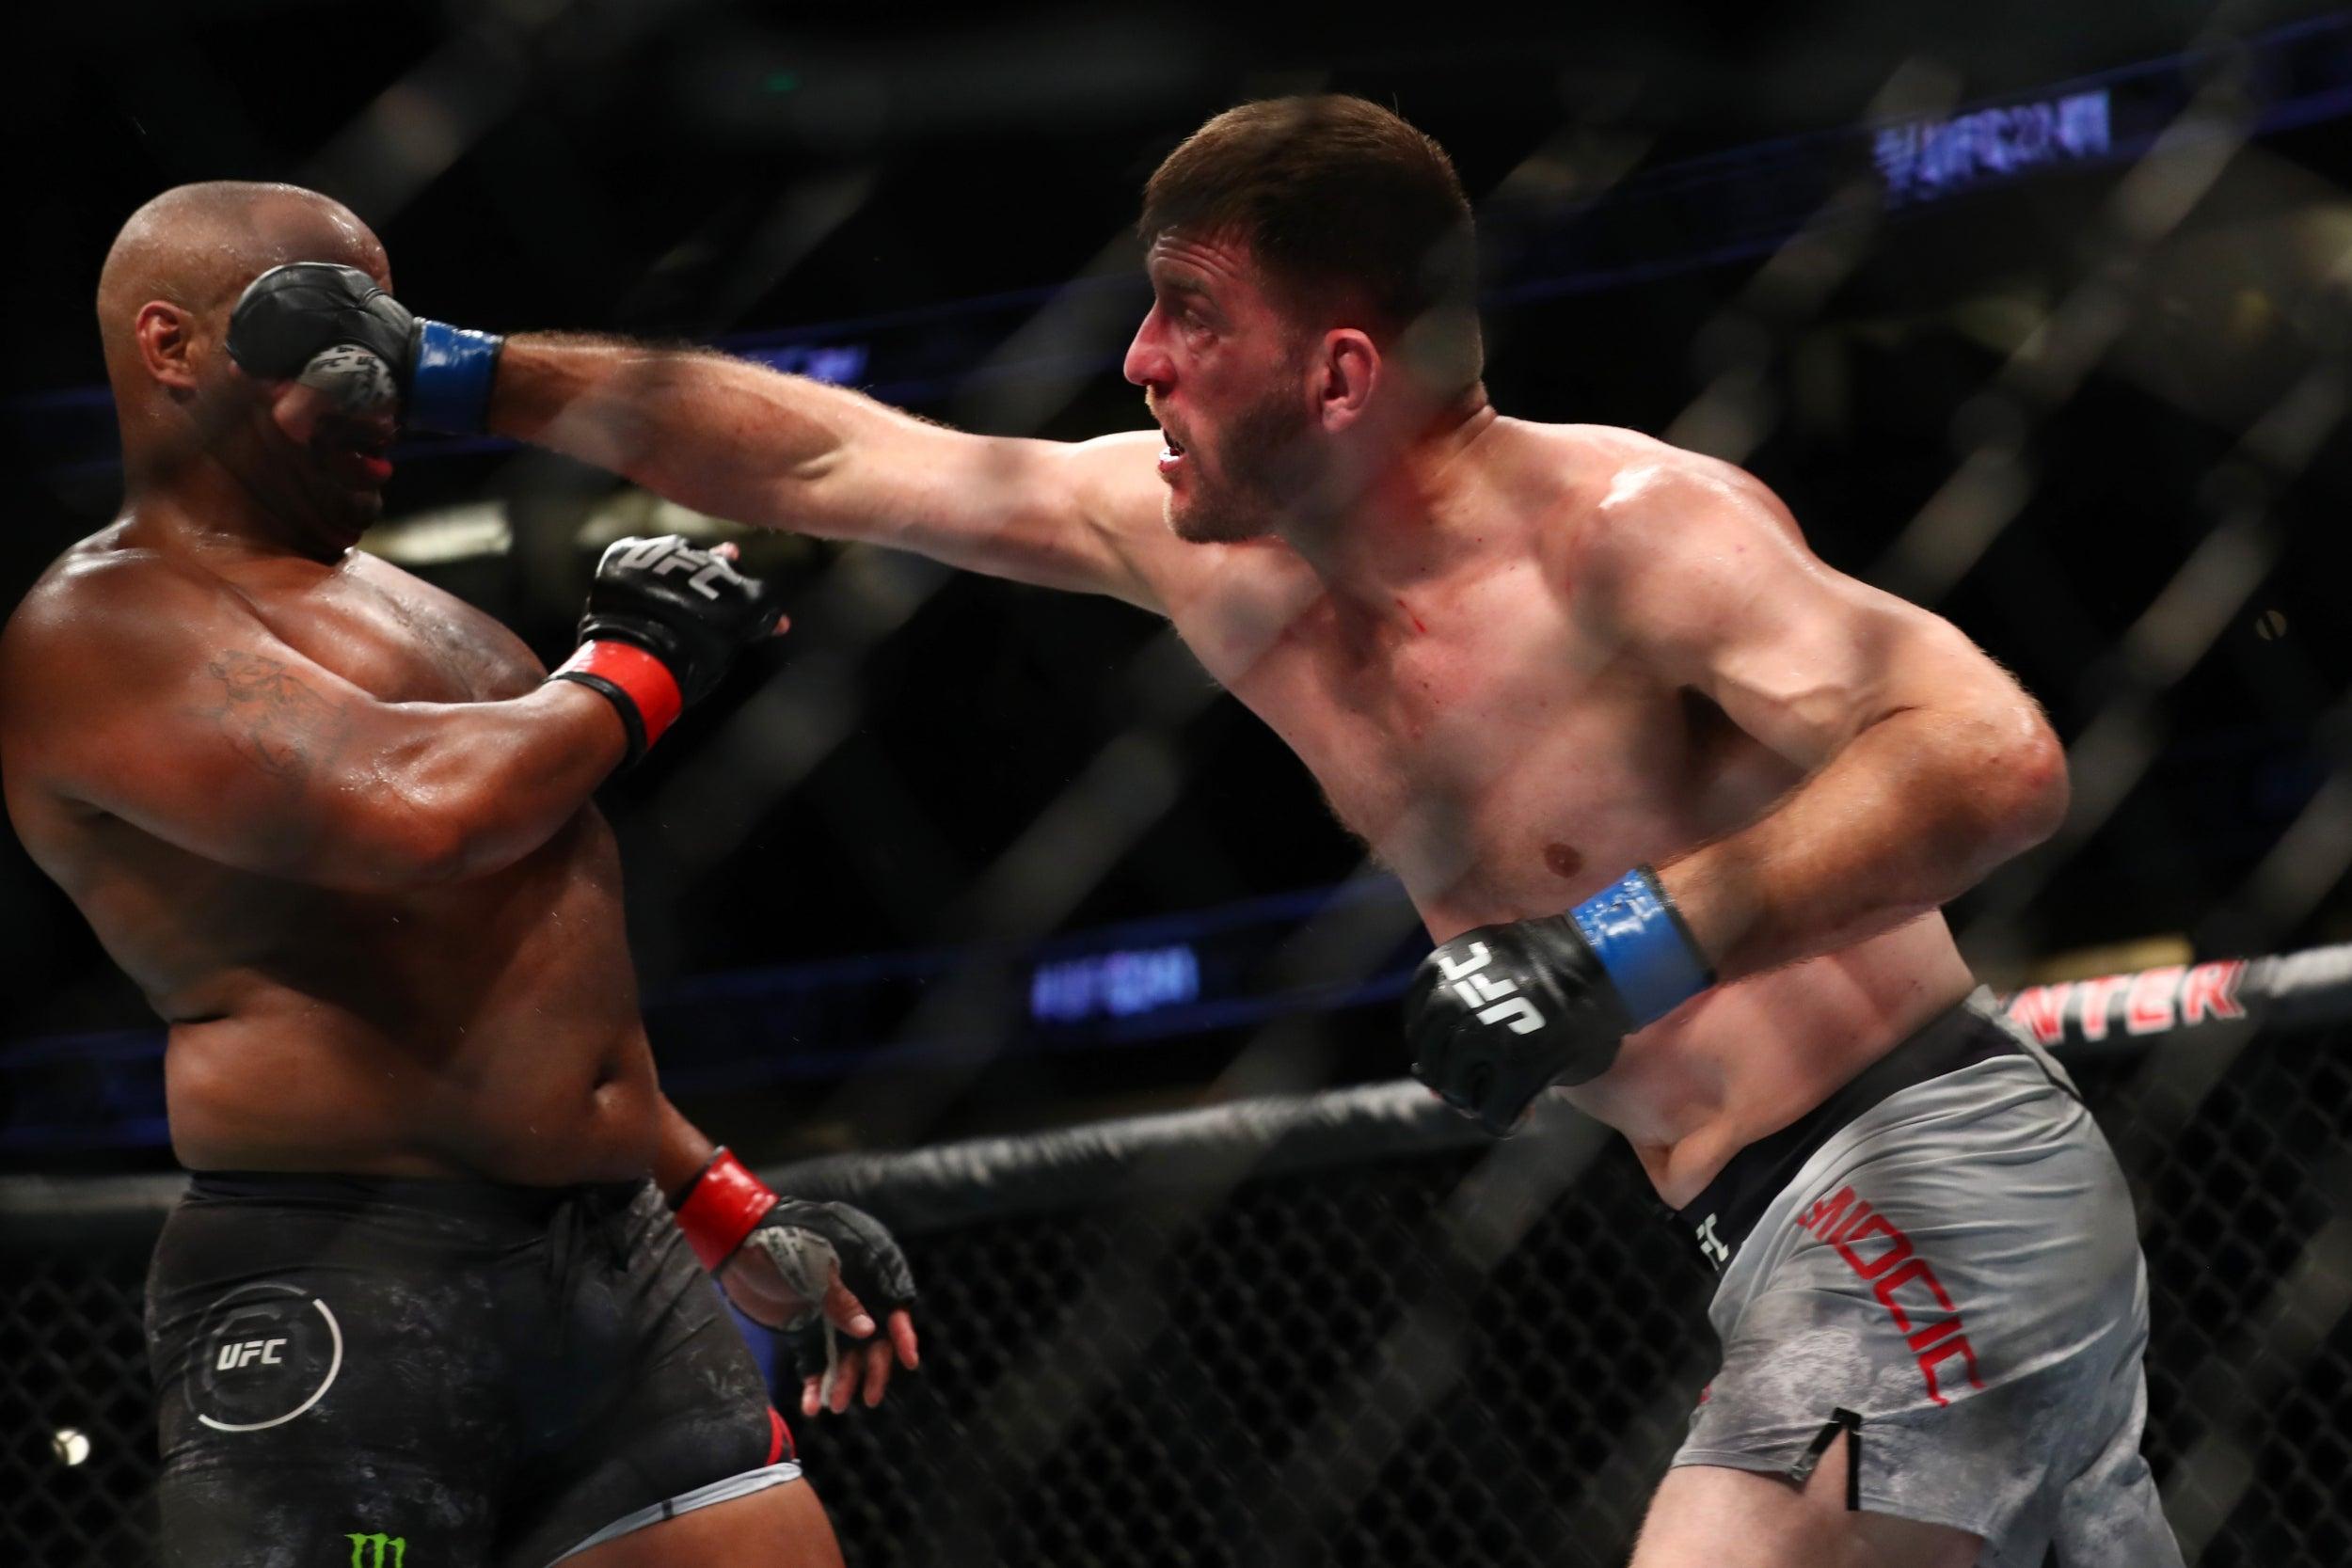 UFC 241 results: Stipe Miocic knocks out Daniel Cormier to gain revenge as Nate Diaz wins on return